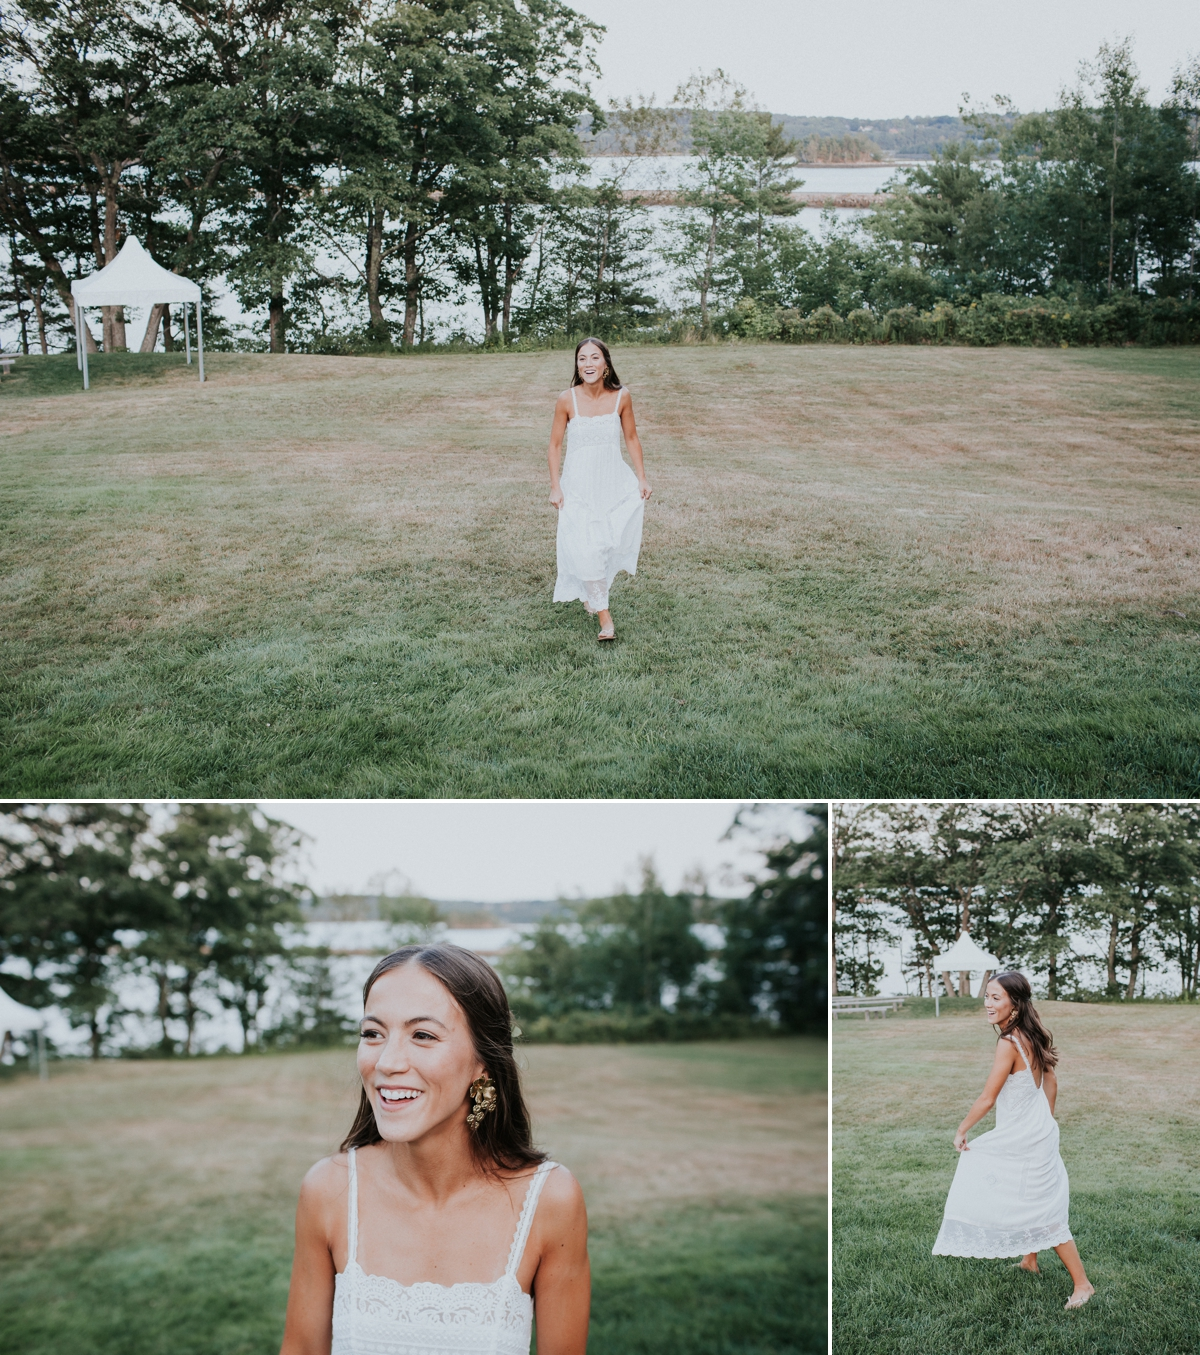 Marianmade-Farm-Wiscasset-Maine-Fine-Art-Documentary-Wedding-Photographer-Elvira-Kalviste-Photography-167.jpg